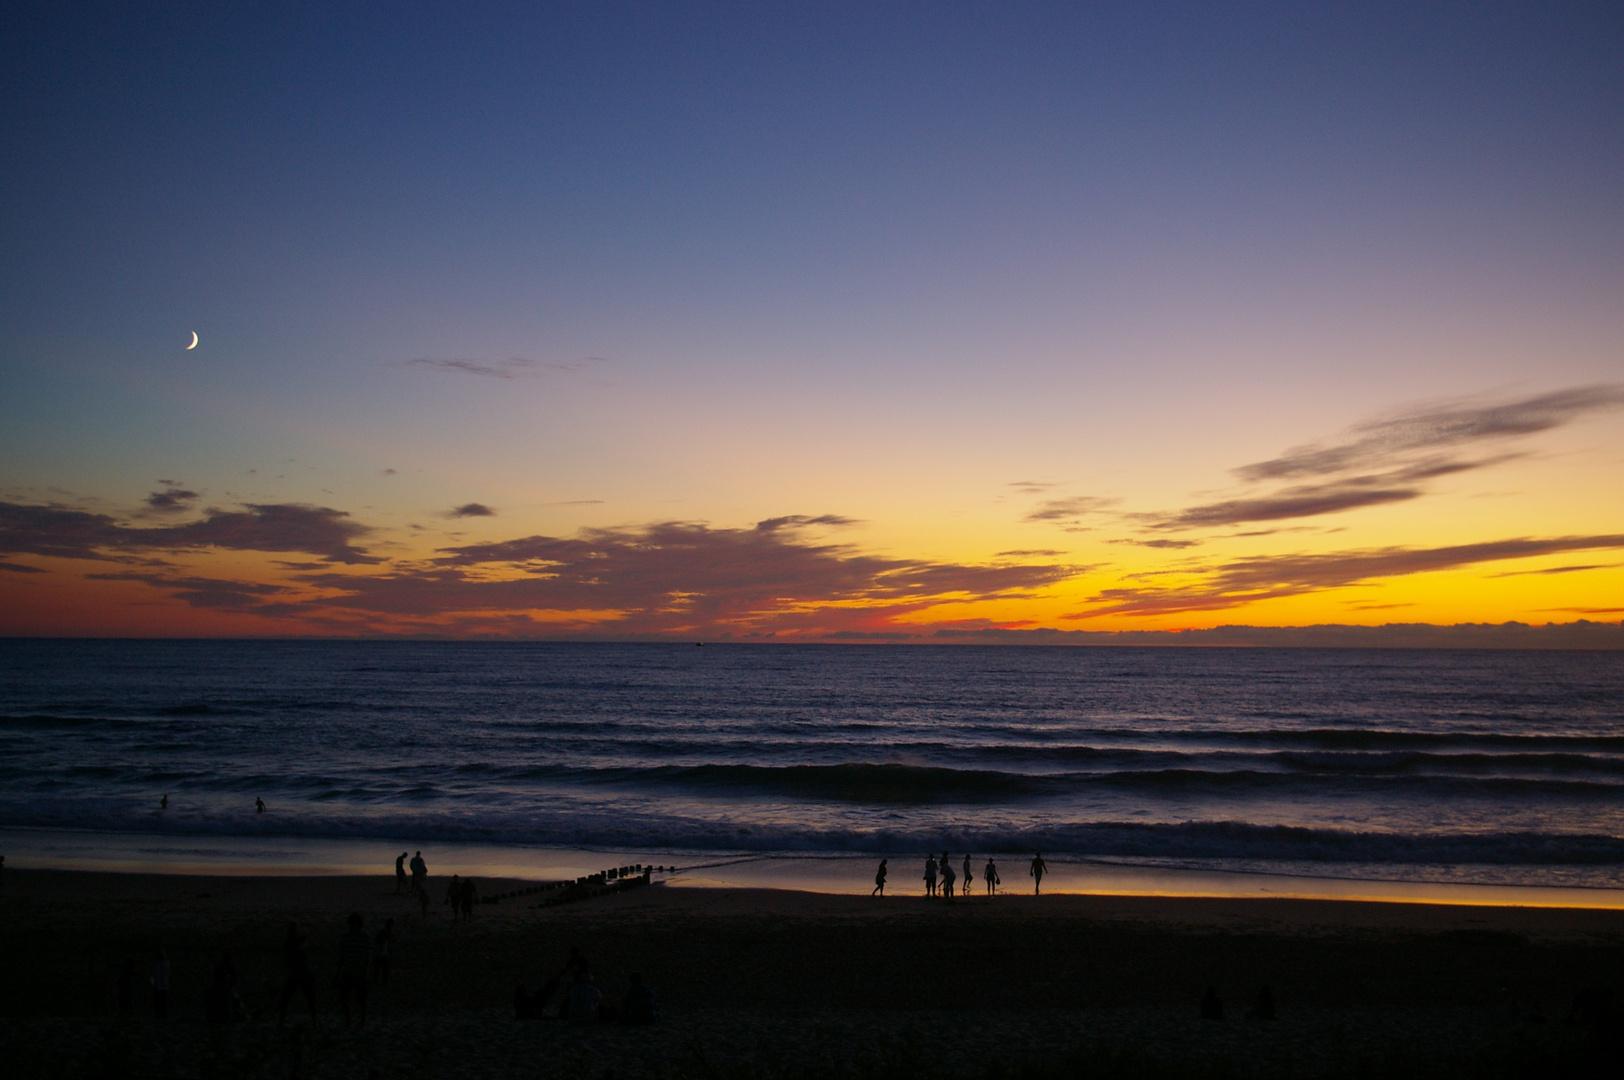 Sonnenuntergang in Mimizan